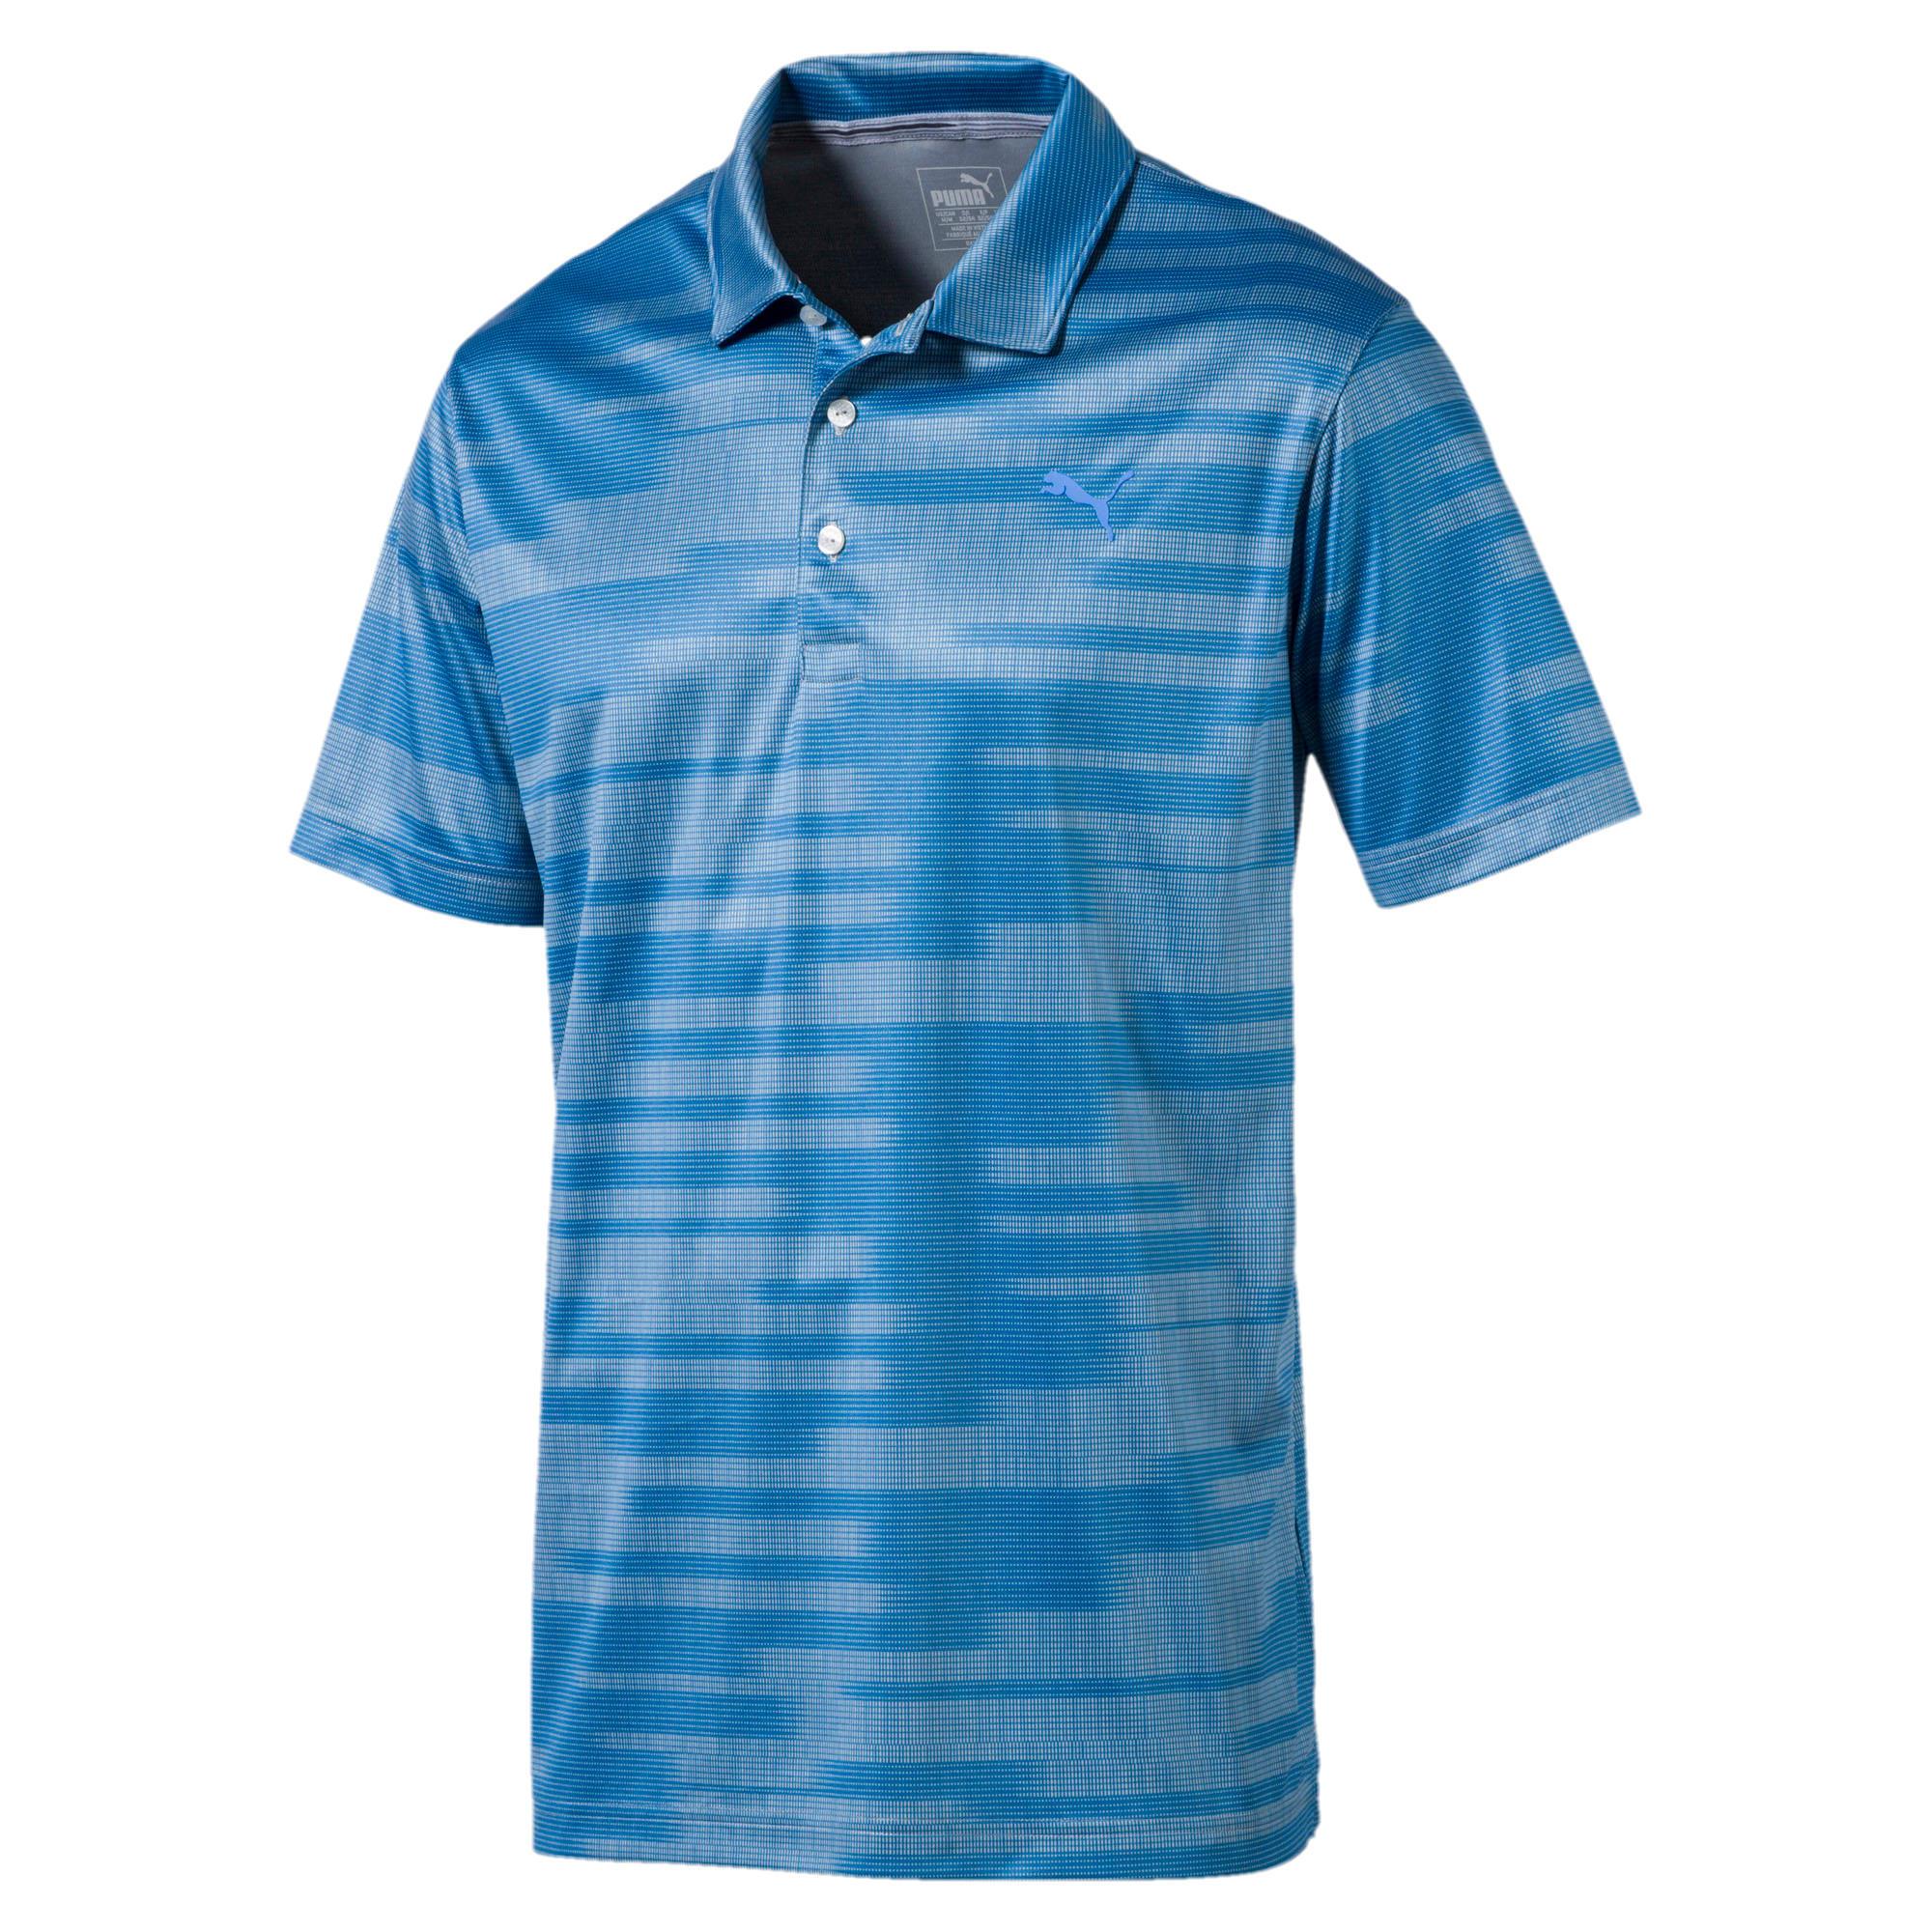 Thumbnail 1 of Golf Men's PWRCOOL Blur Polo, marina, medium-IND